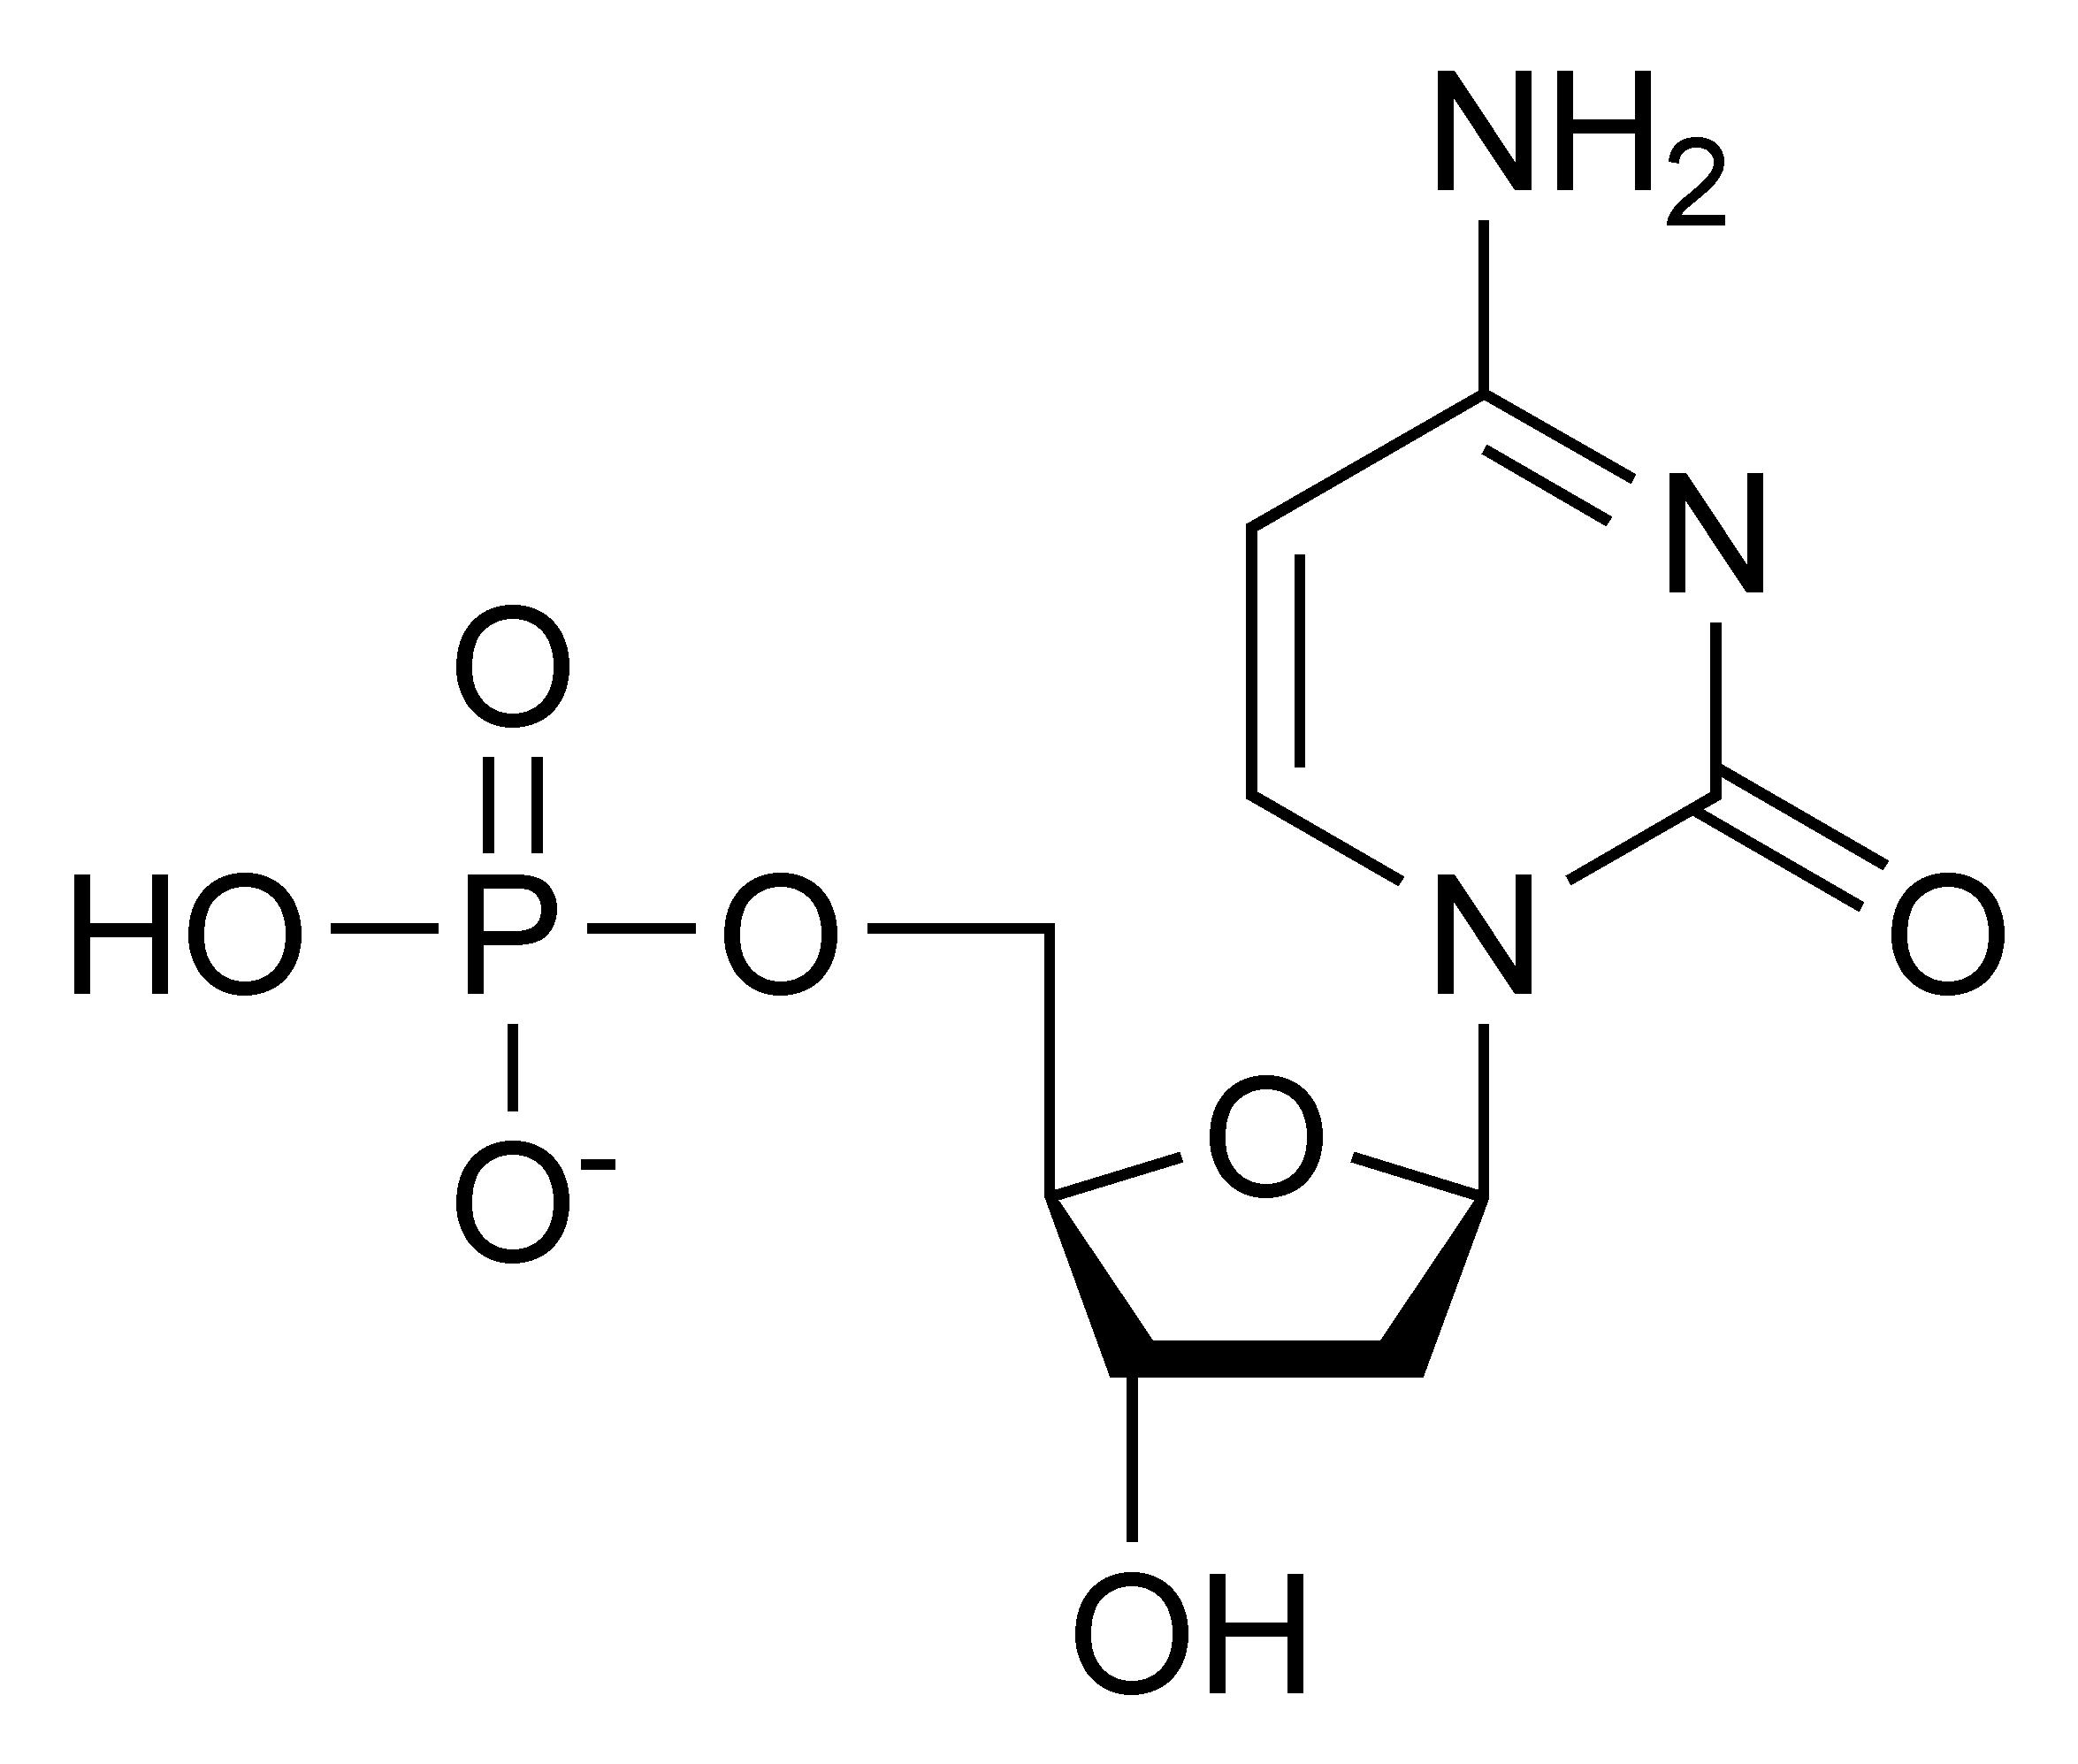 deoxycytidylic acid